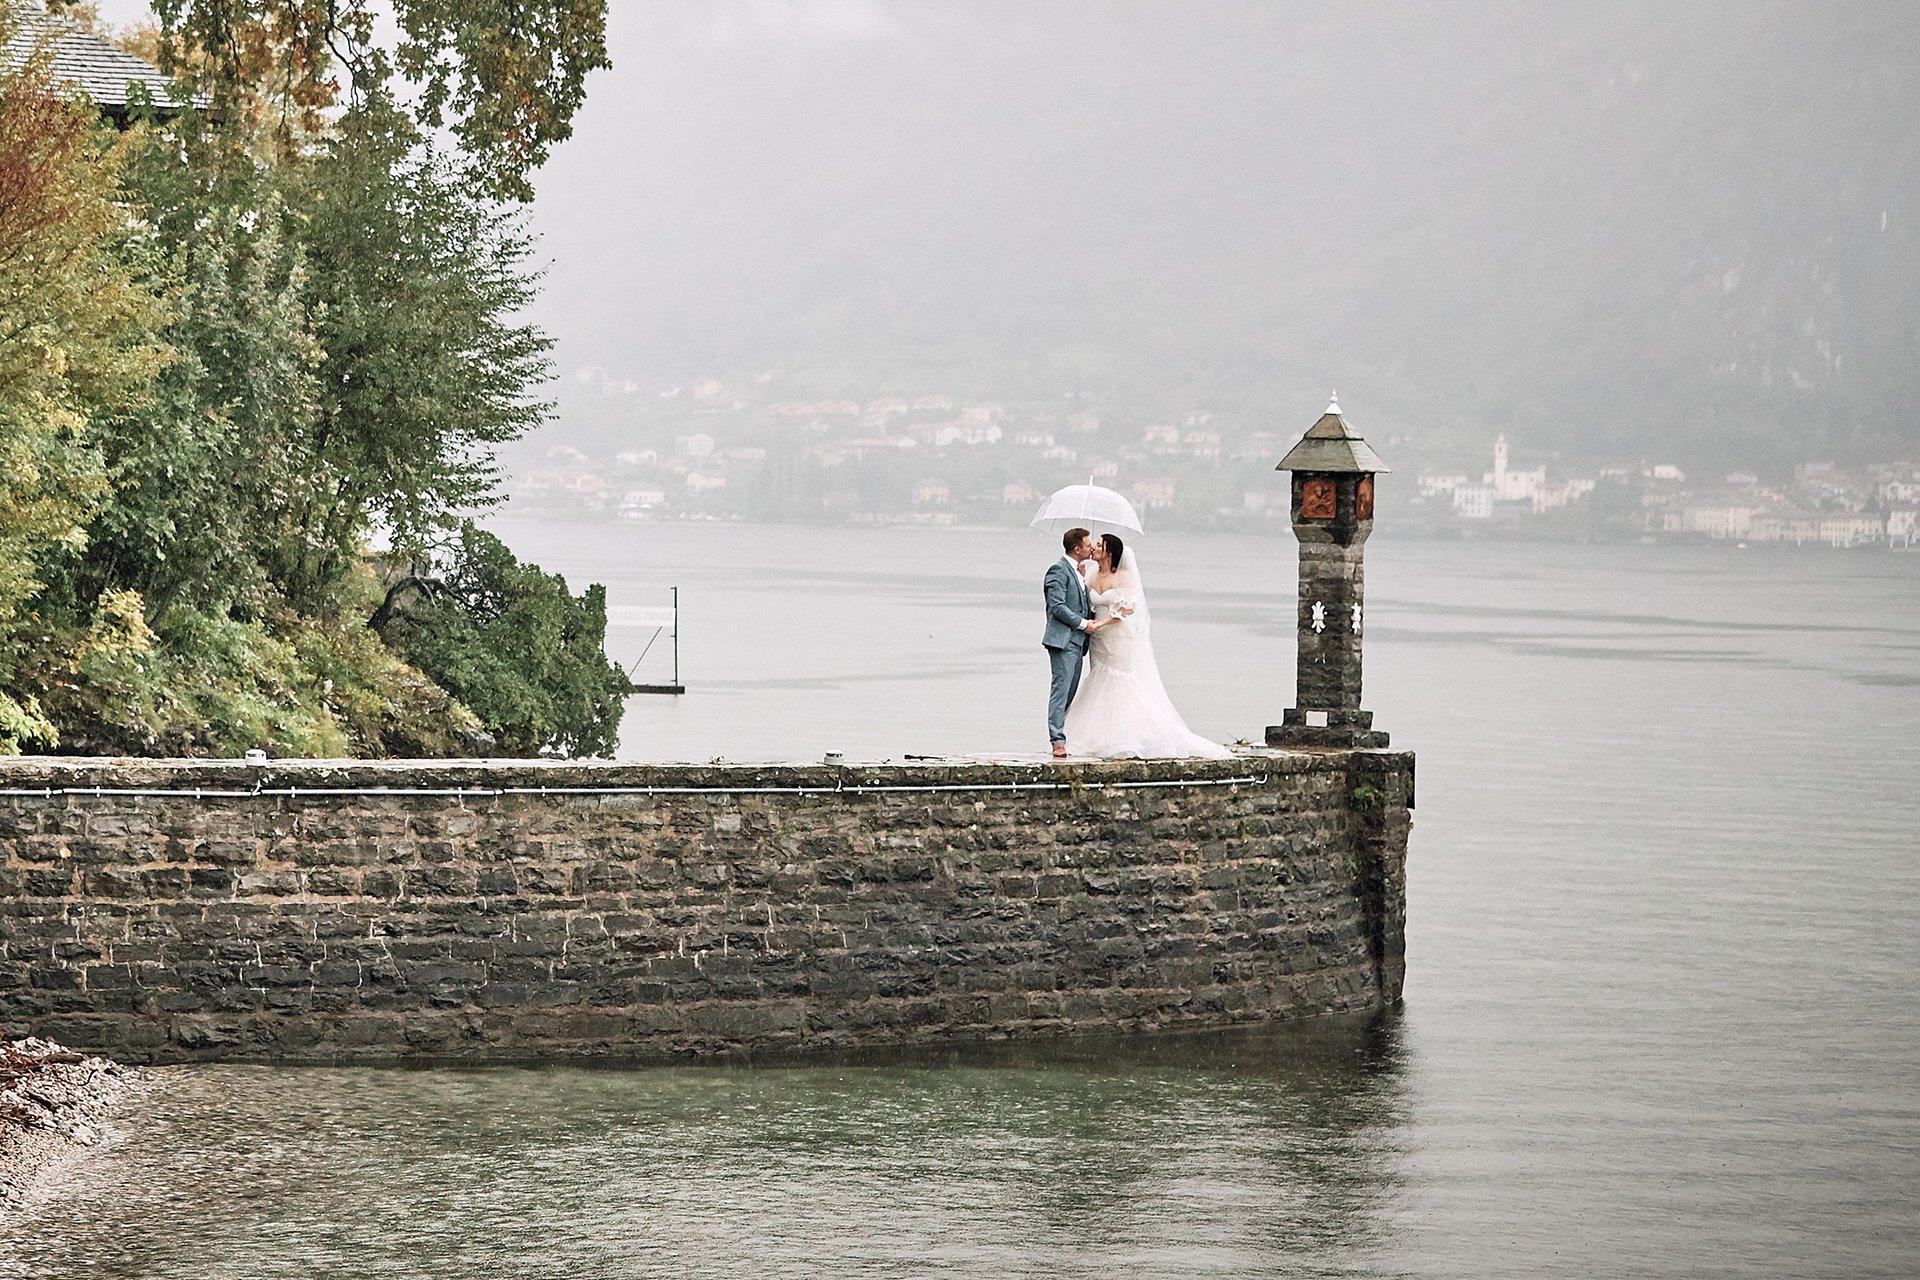 Lovely wedding under the rain